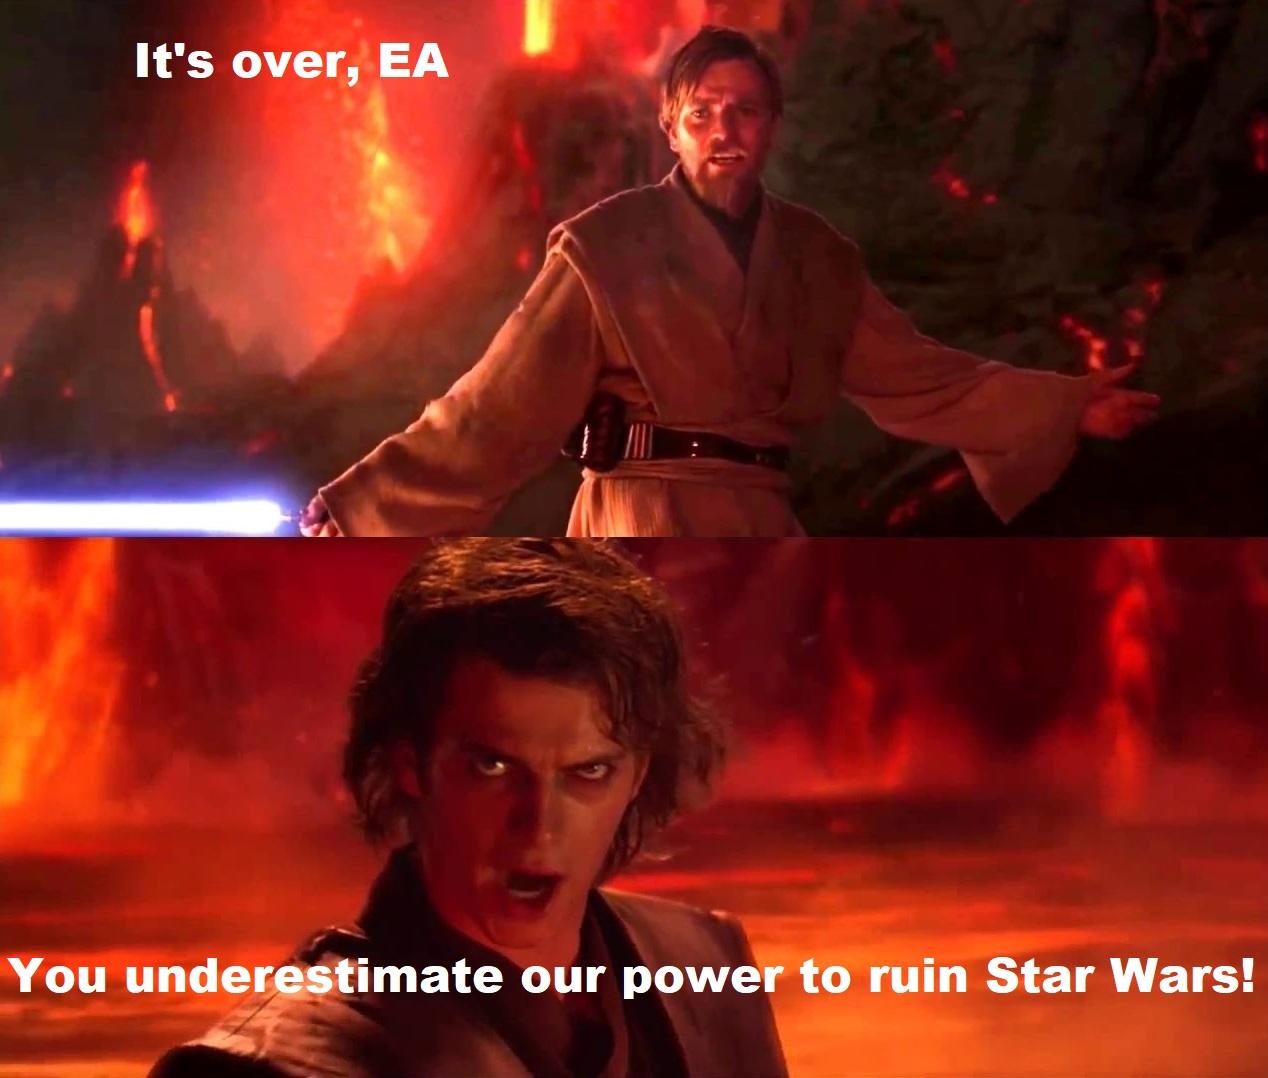 It's over, EA.